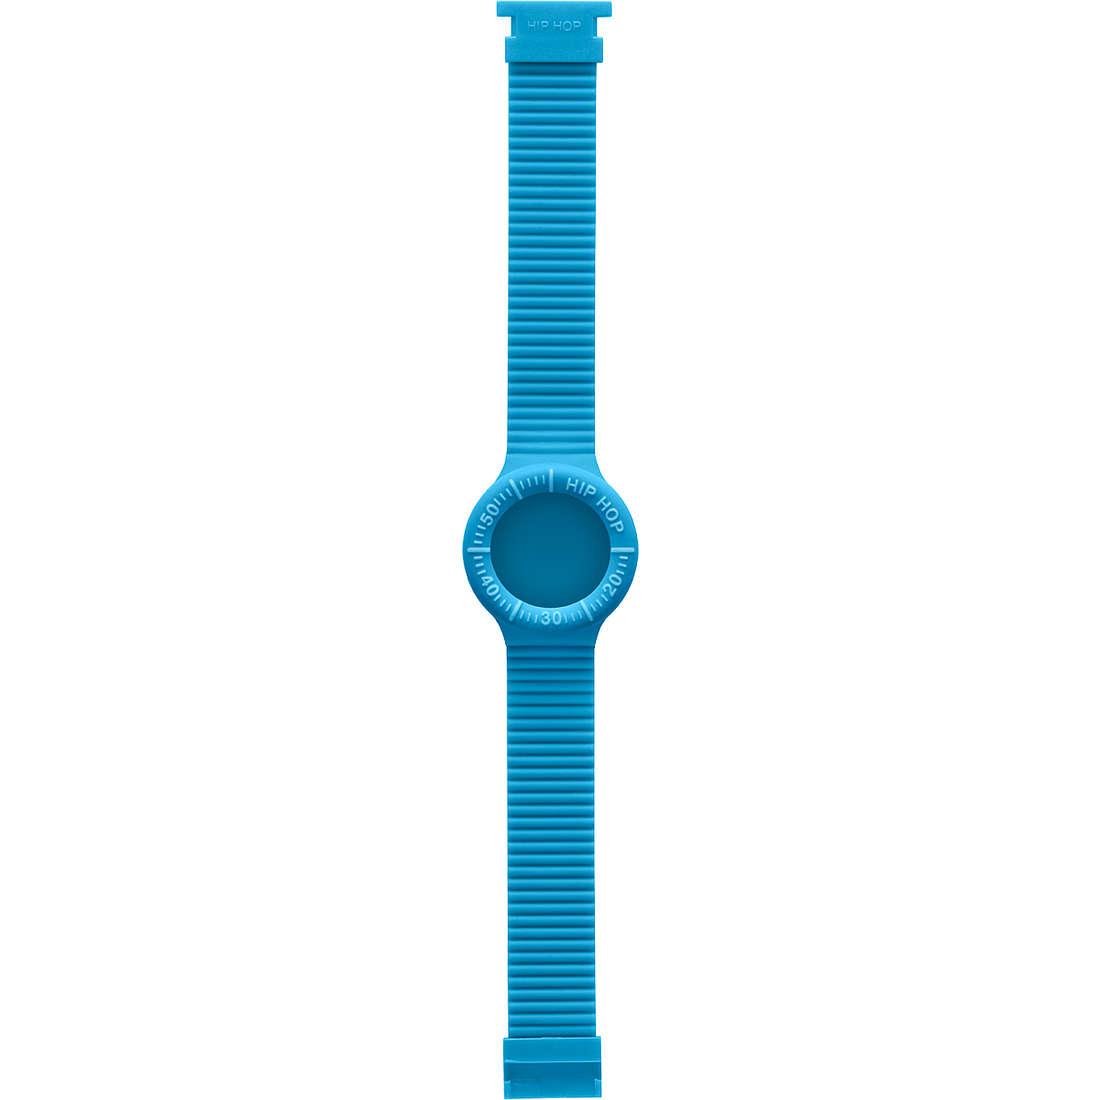 orologio accessorio unisex Hip Hop Hero HBU0131